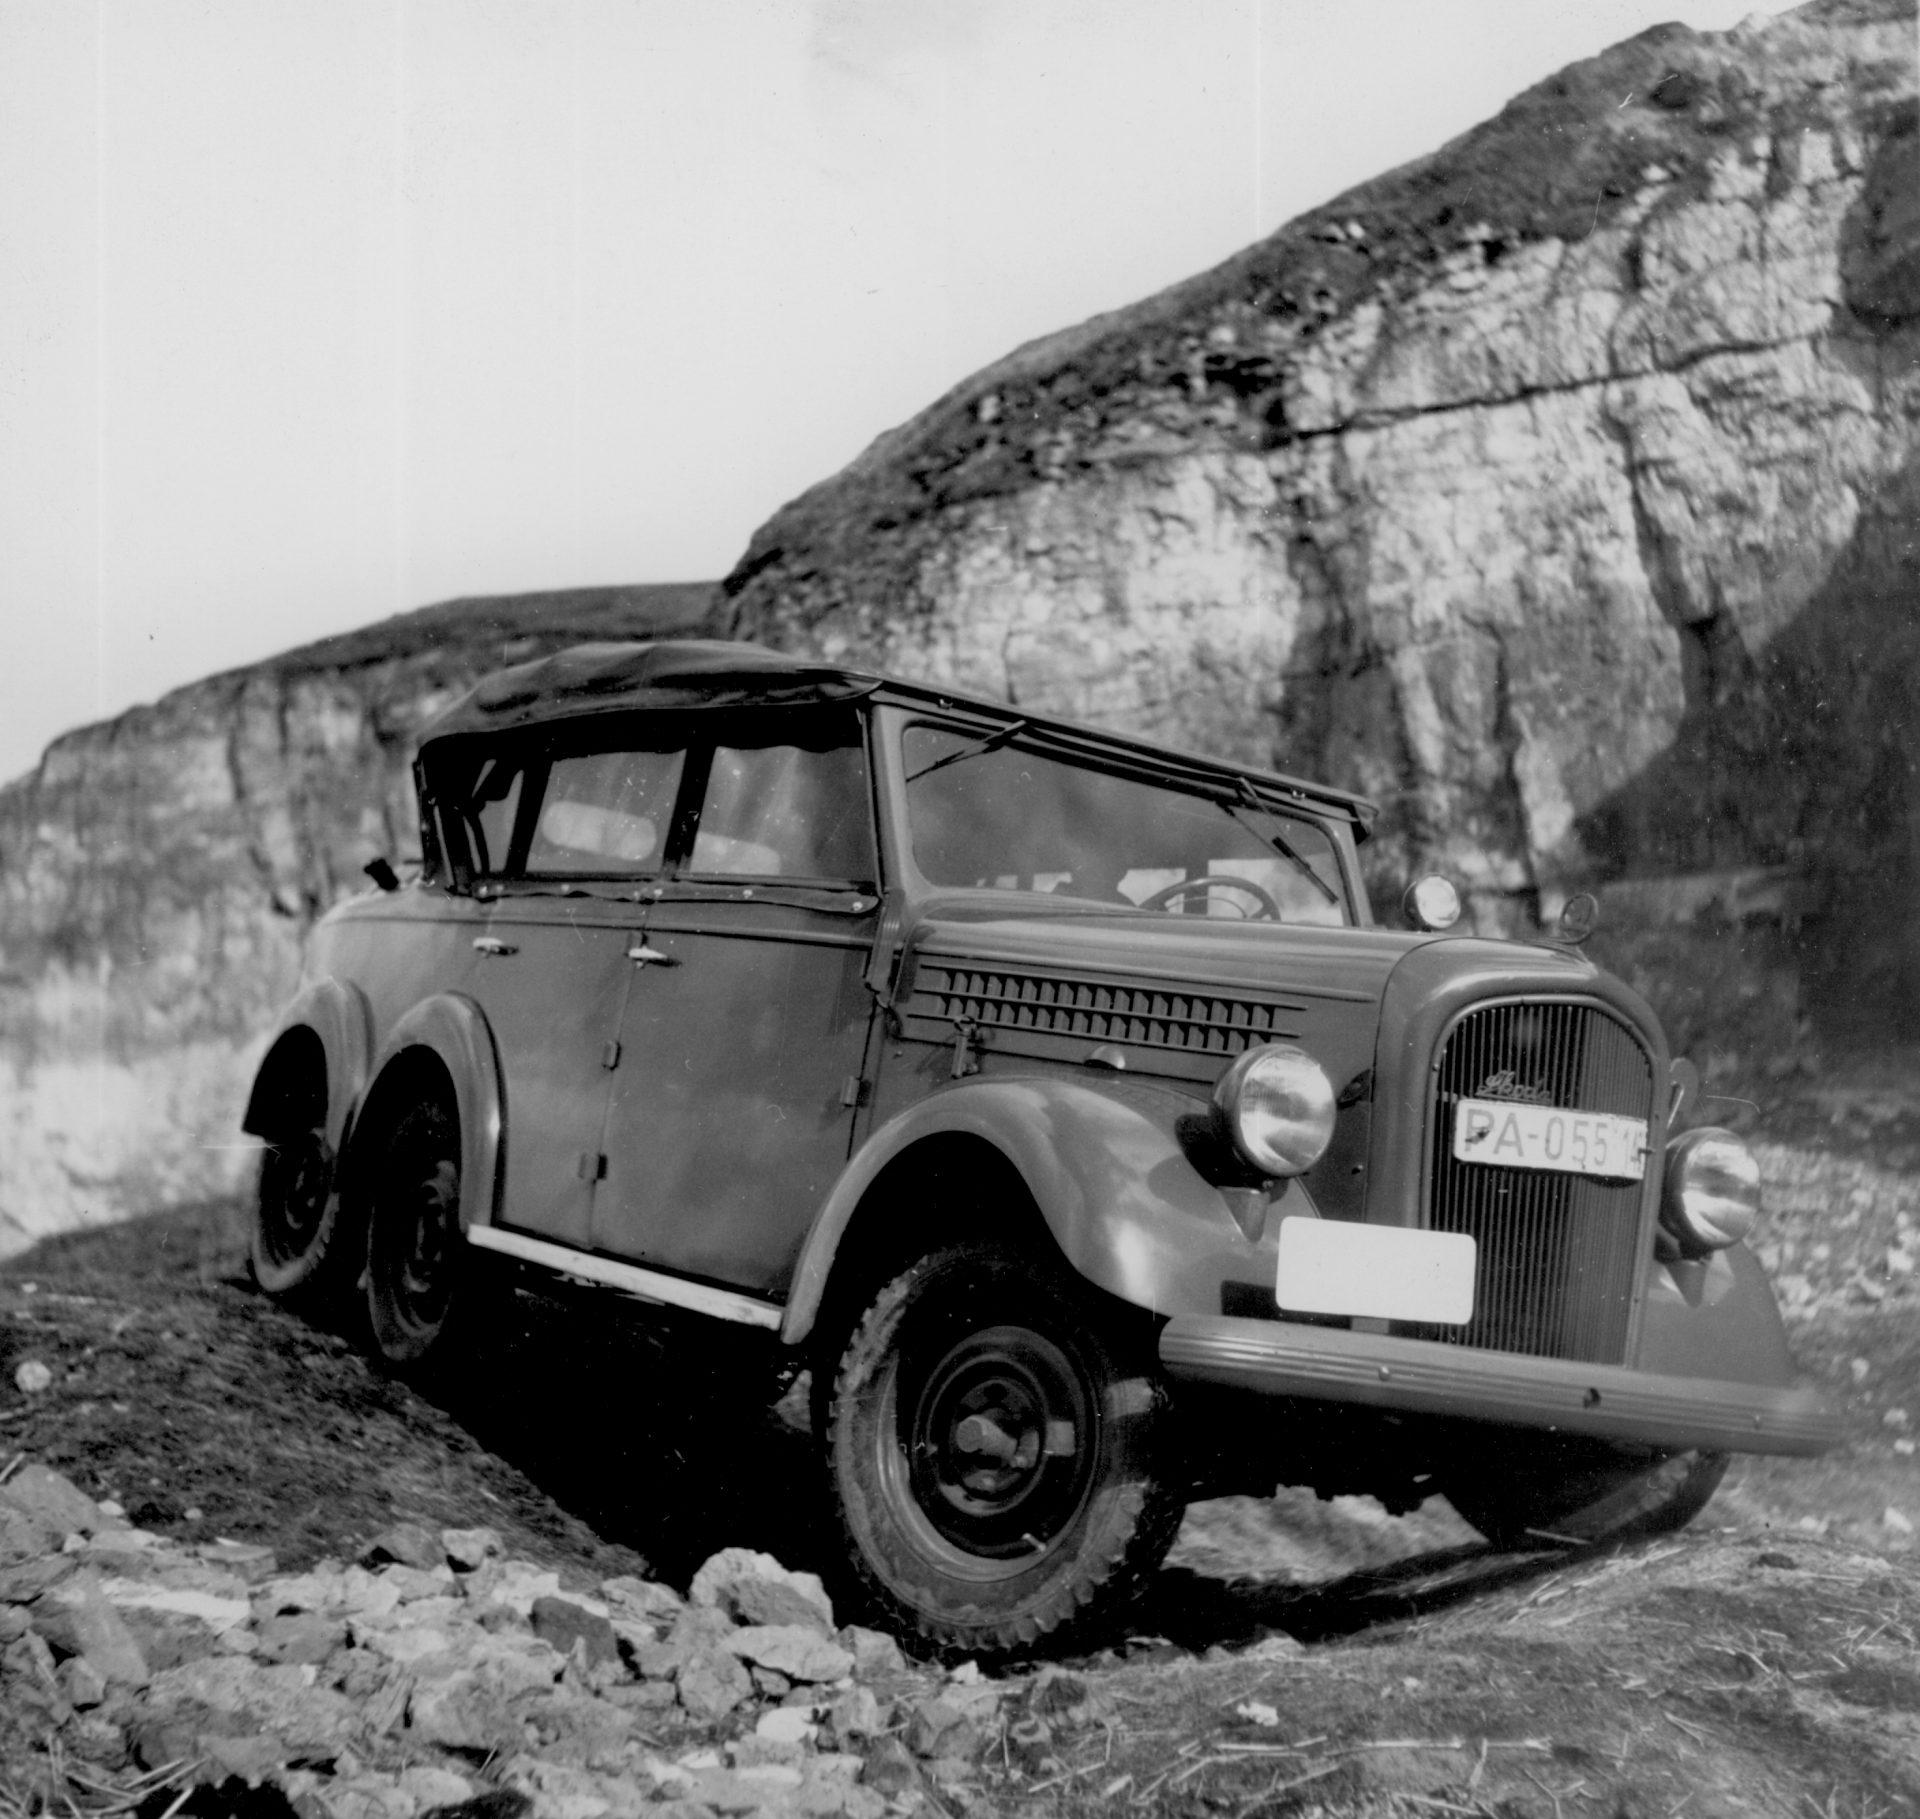 180530-Automobily-ŠKODA-ve-službách-československé-armády-ŠKODA-903-1-1920x1819